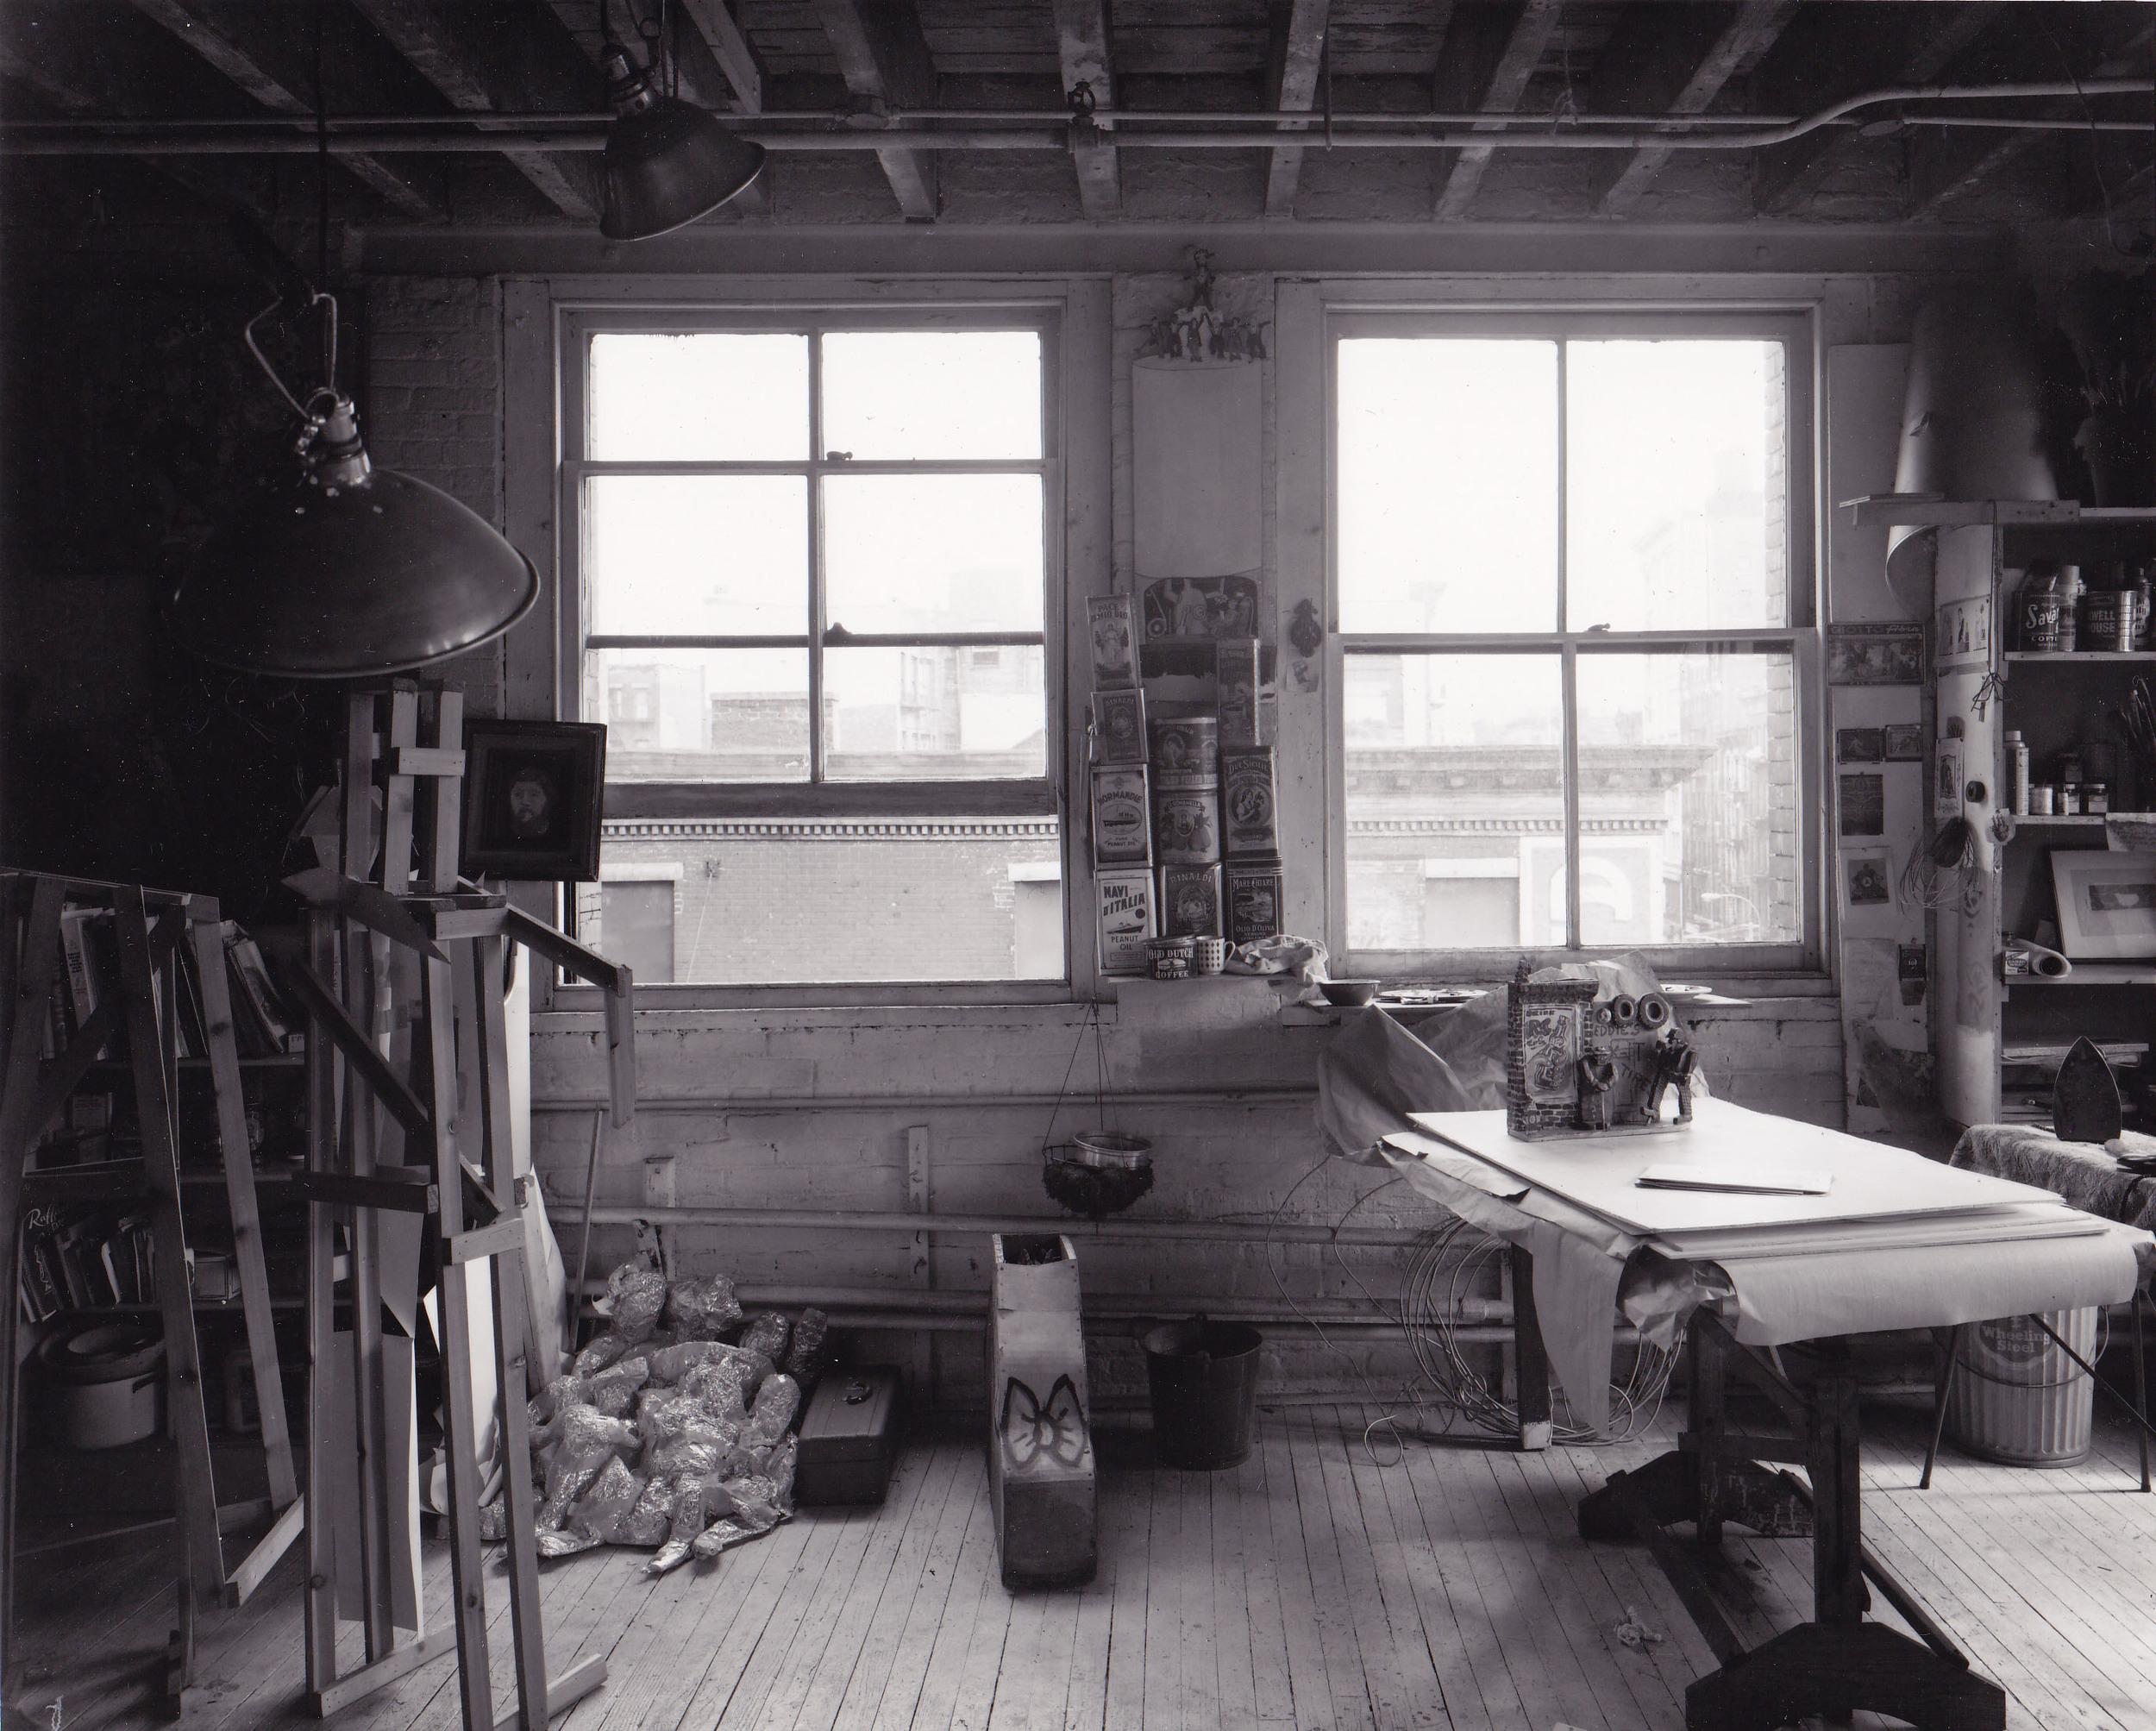 Studio Mulberry Street NYC, 1973, photo by Jordan Davies (2).jpg